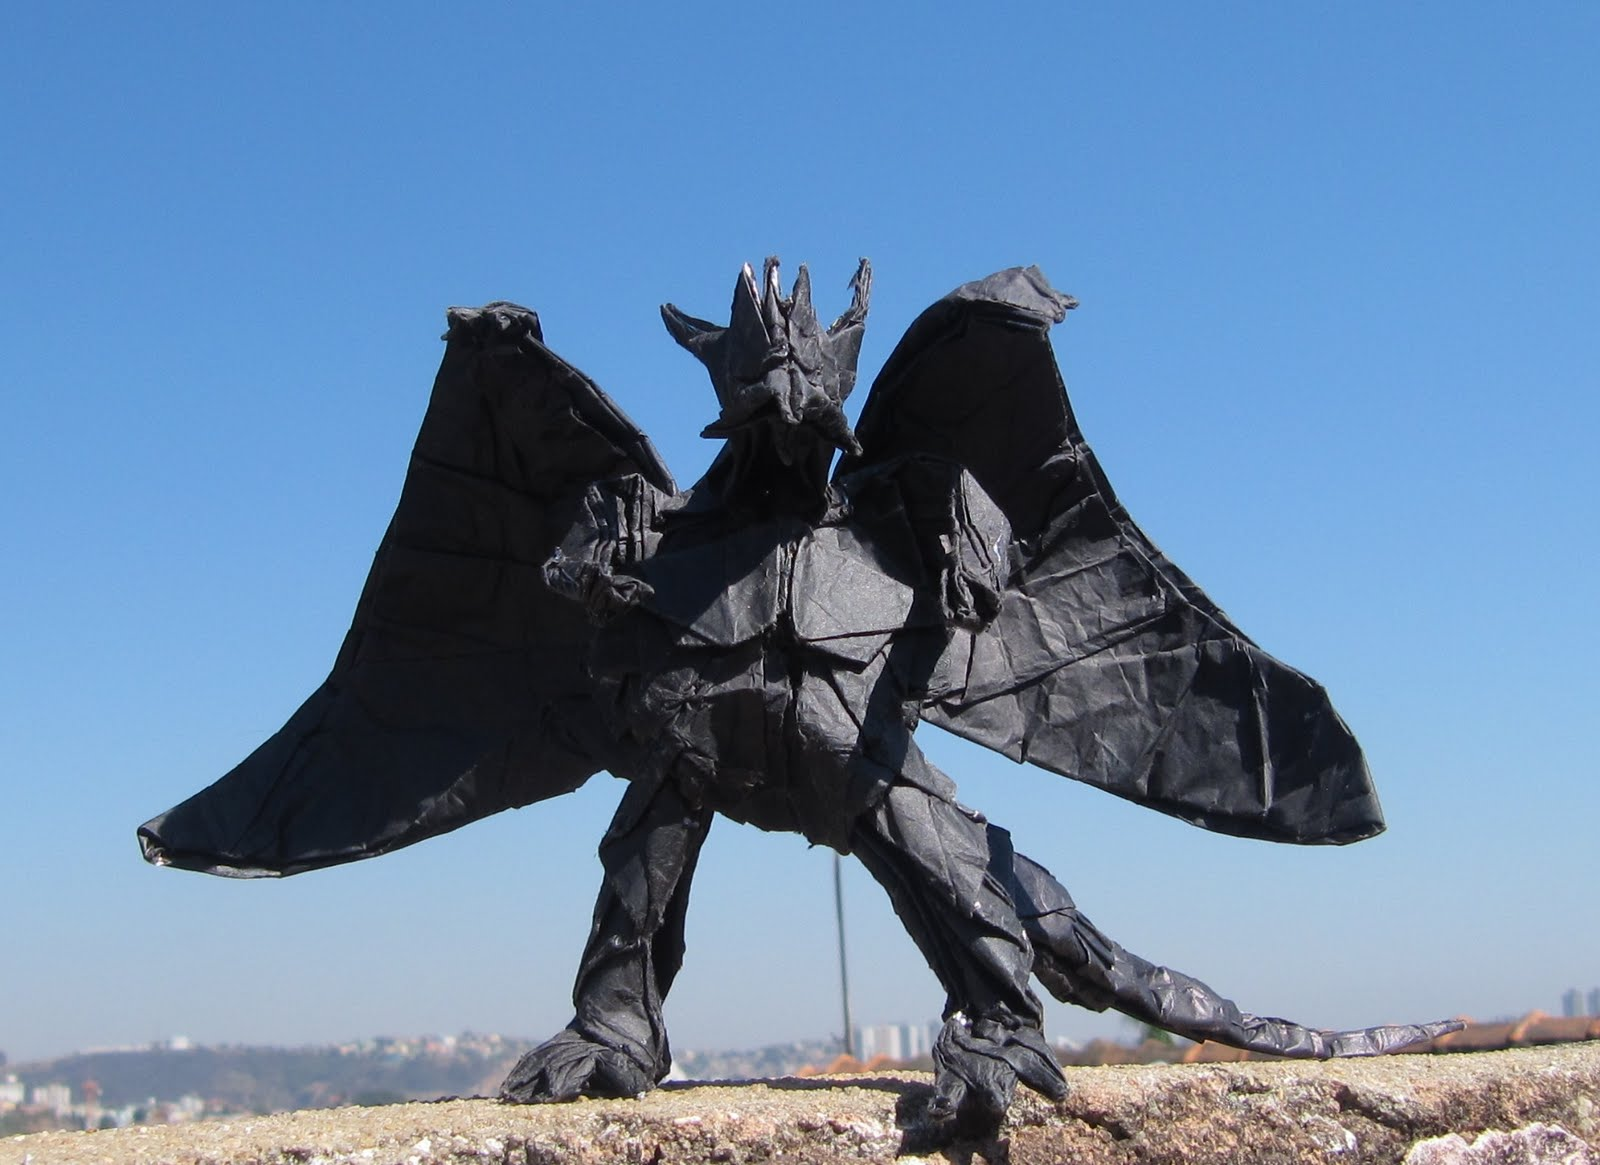 XPUP  Origami Bahamut  Divine Dragon  - Satoshi KamiyaOrigami Divine Dragon